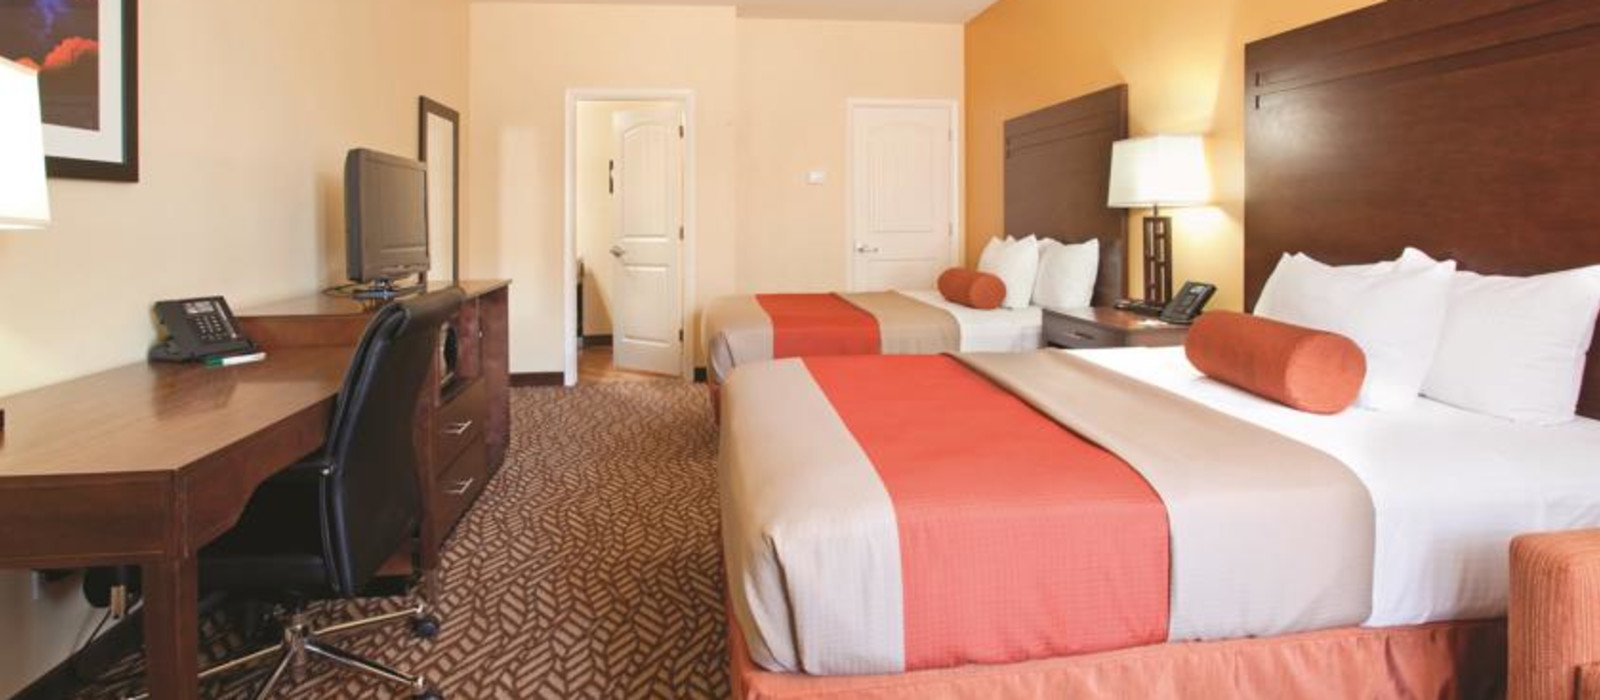 Hotel La Quinta Inn & Suites Zion USA